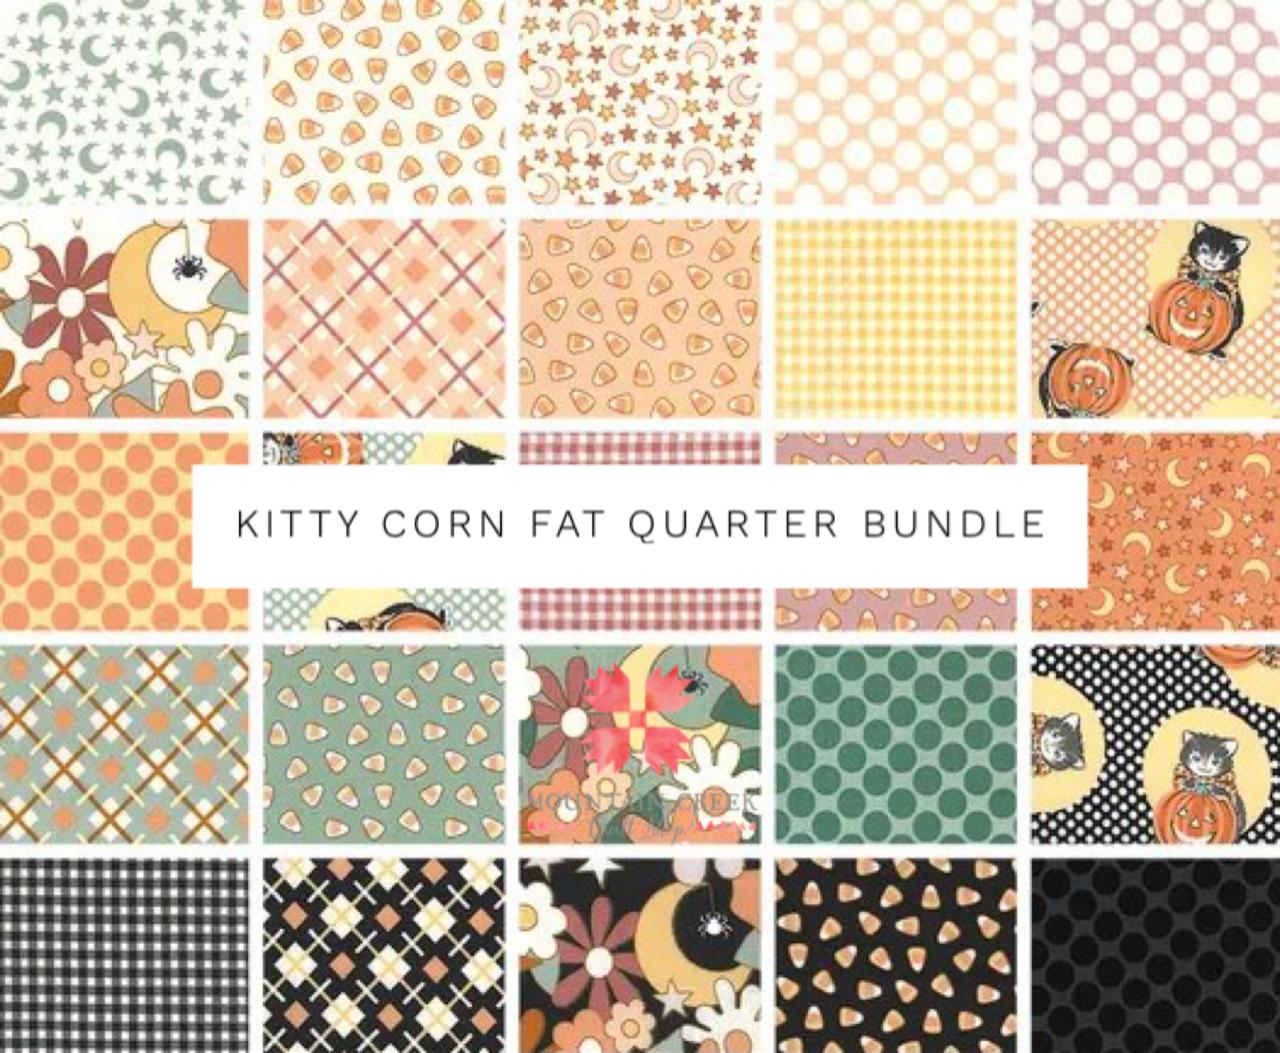 Kitty Corn Fat Quarter Bundle